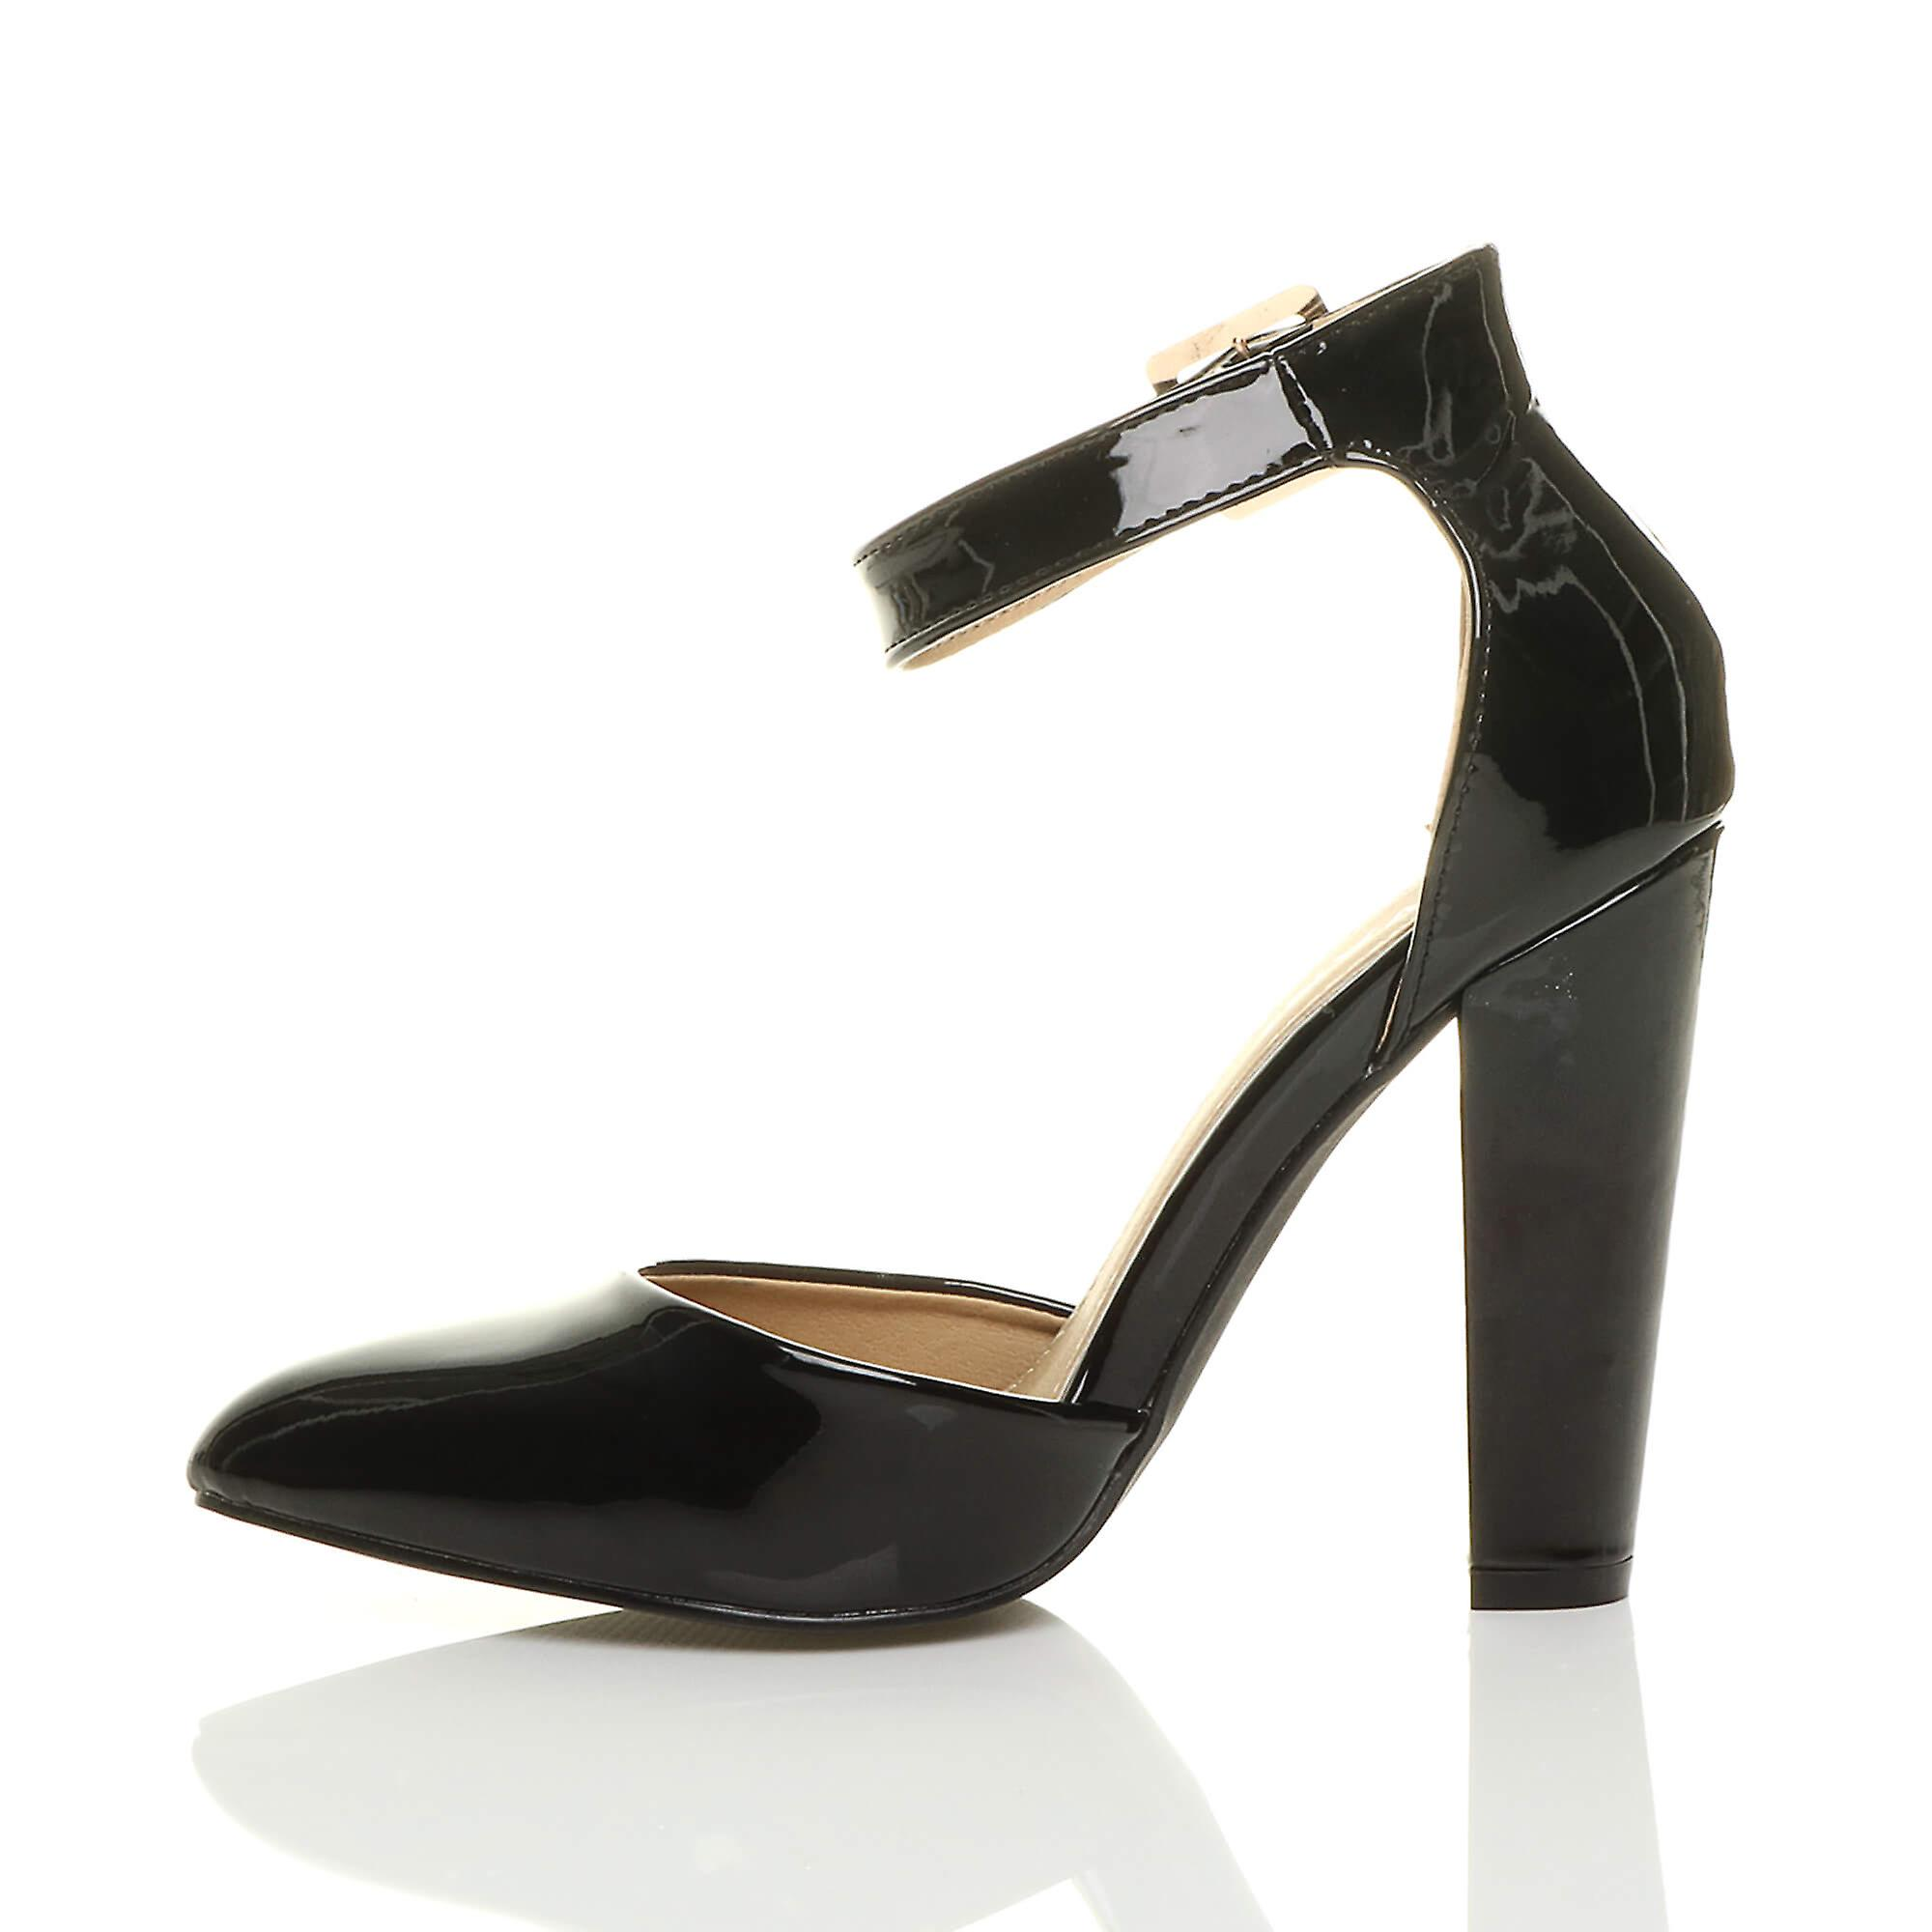 cuff strap sandals ankle high Ajvani womens court shoes buckle block heel pointed pumps g7WSqInST